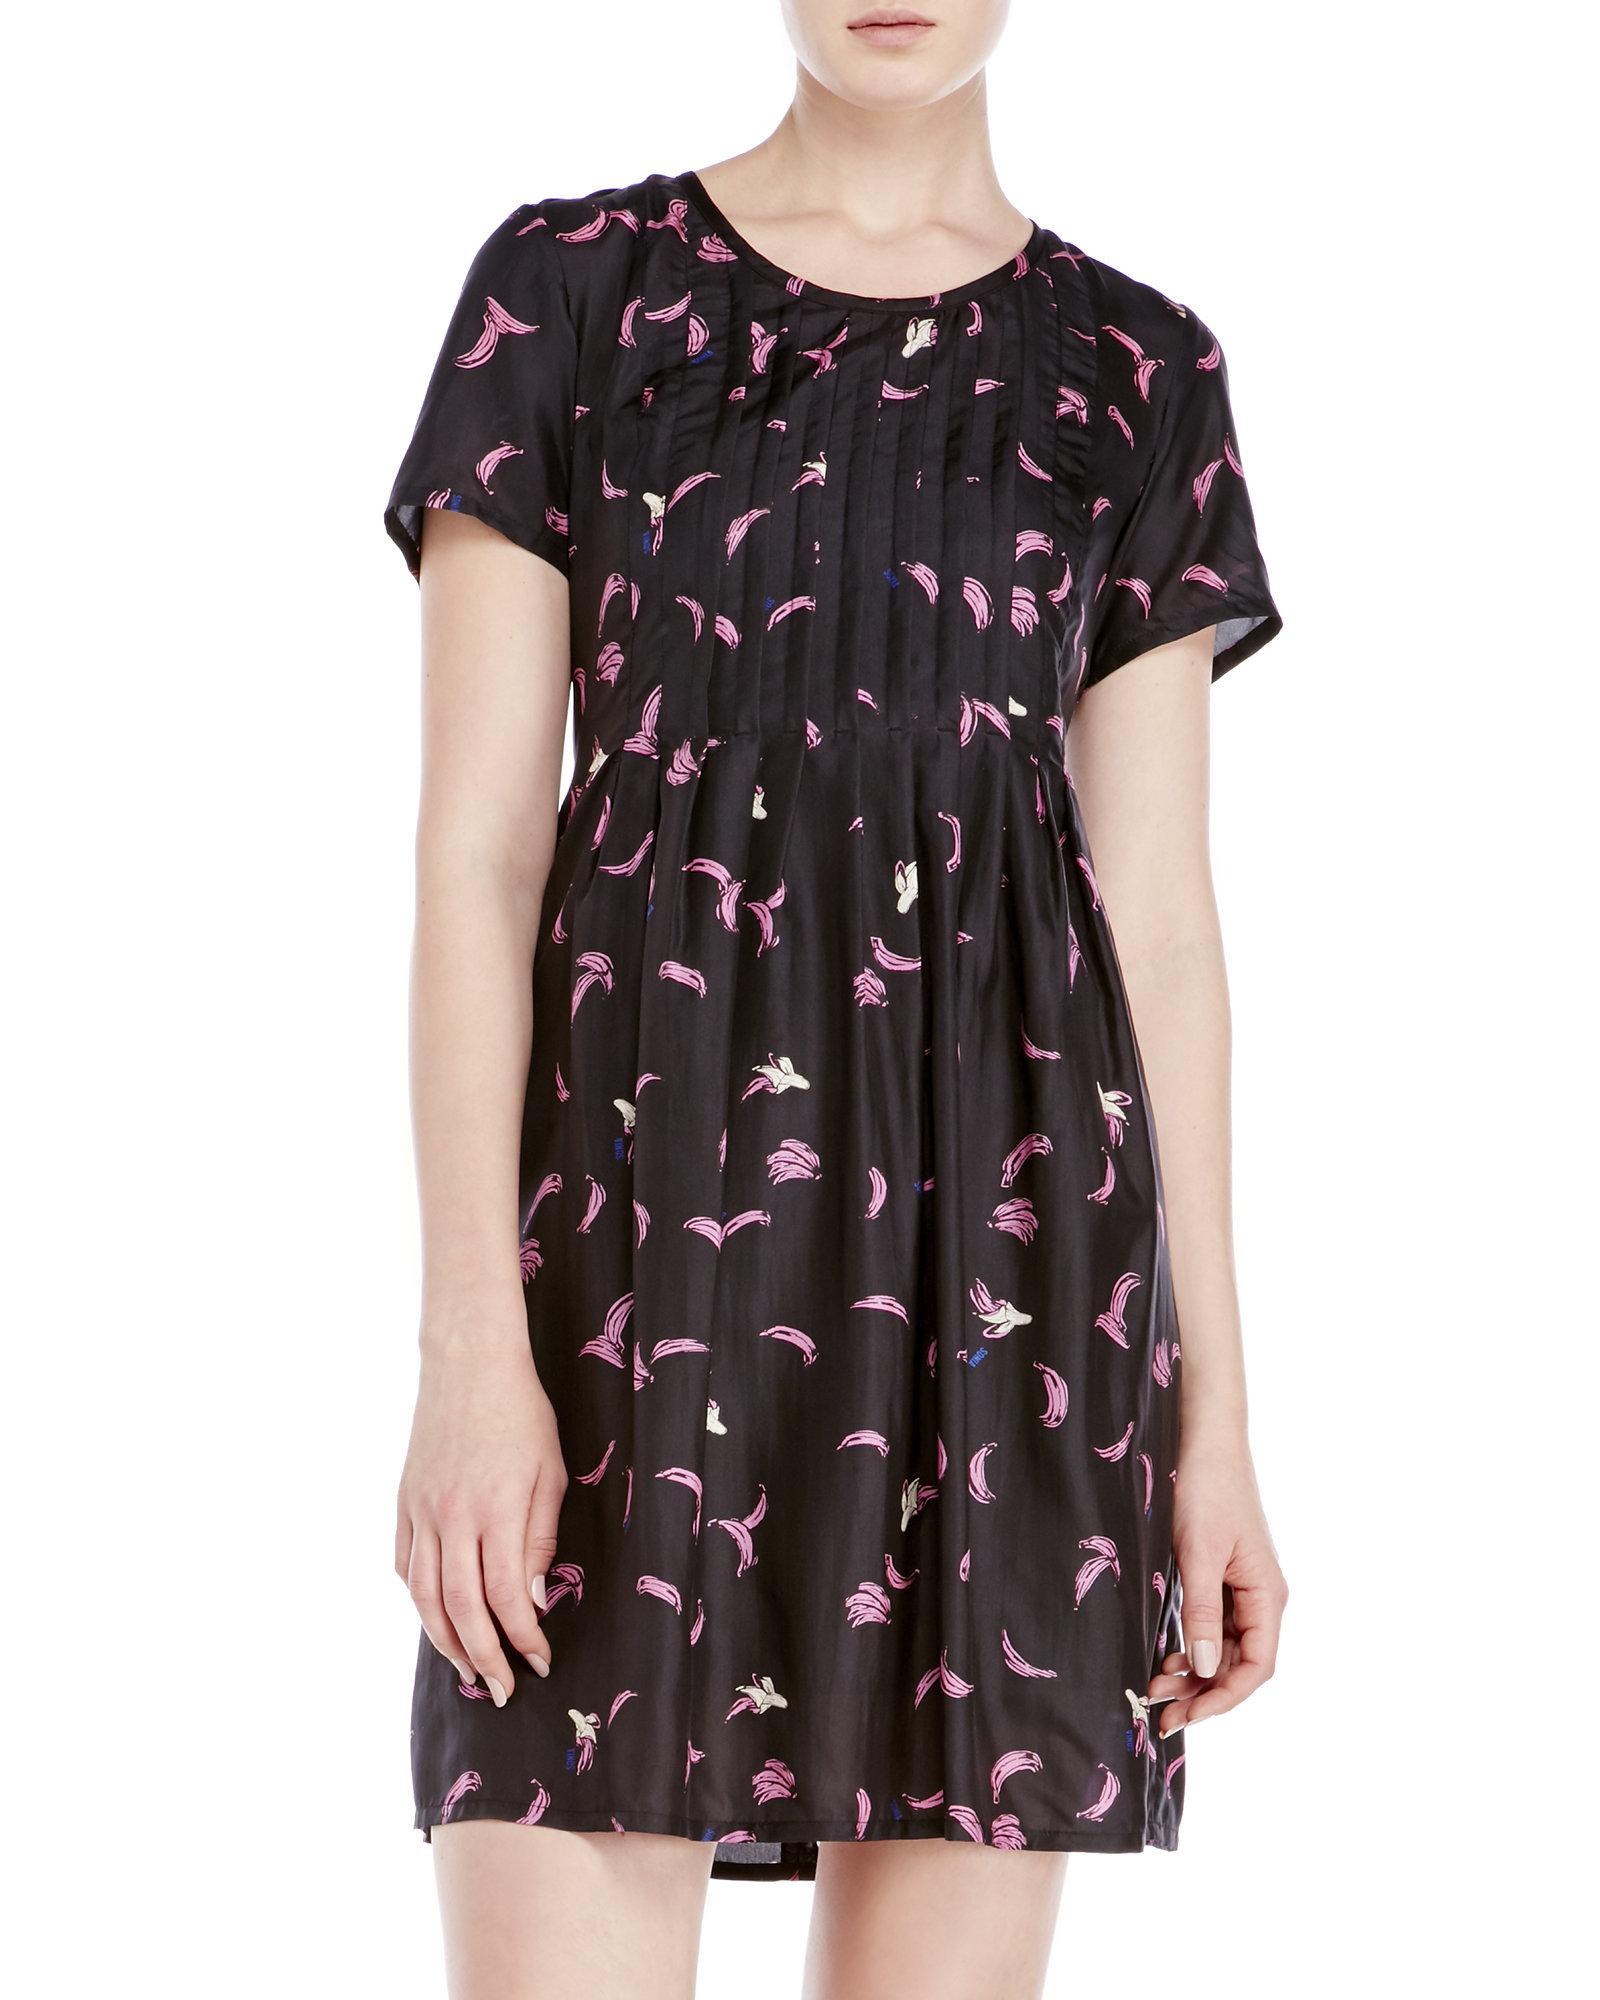 Dress Rykiel Banana Print By In Black Silk Sonia Lyst Pleated yvwOP8mNn0